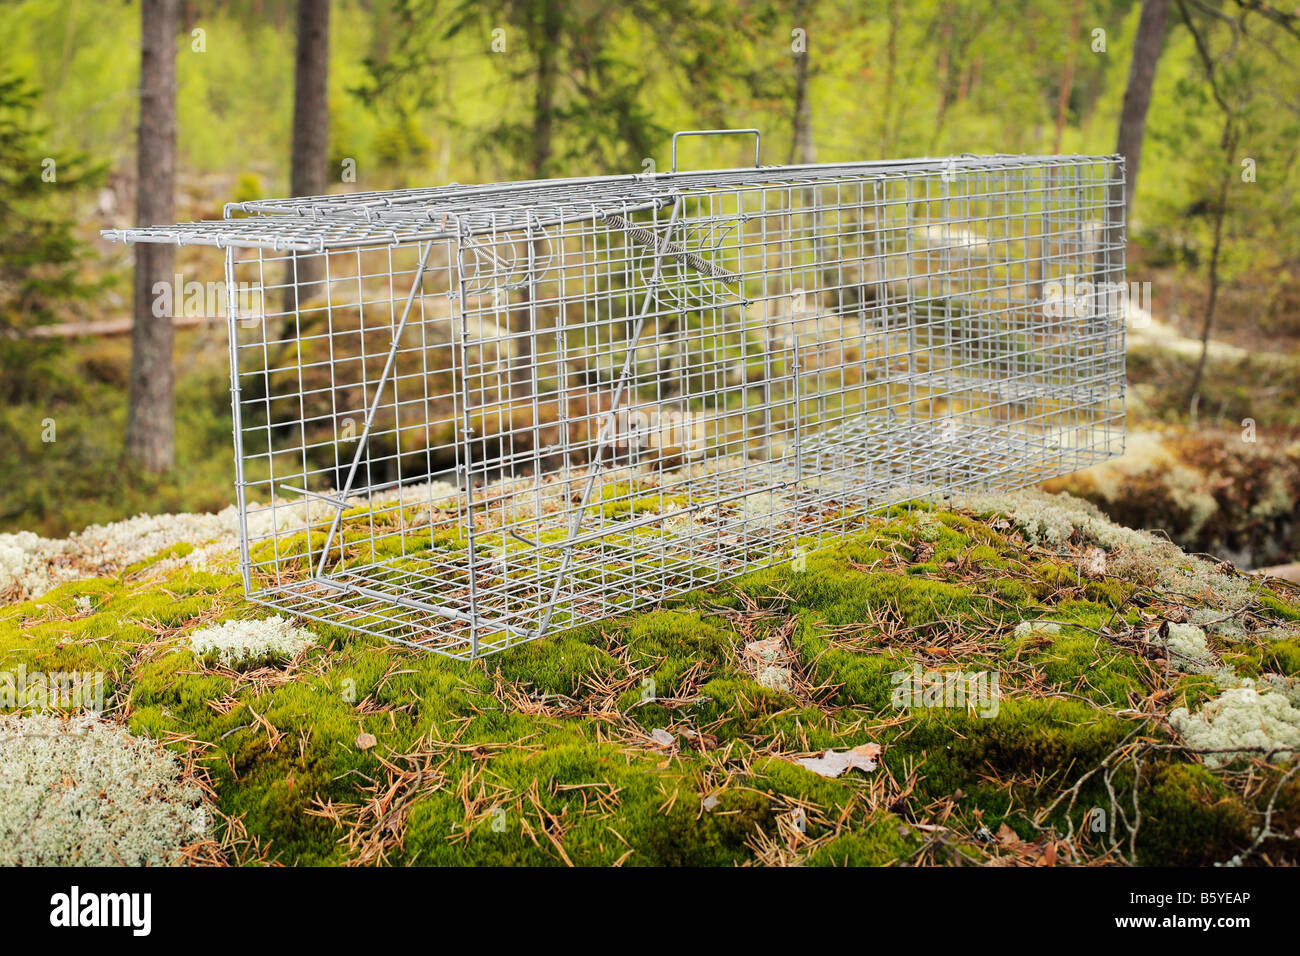 Humane metallic raccoon dog trap in forest setting - Stock Image